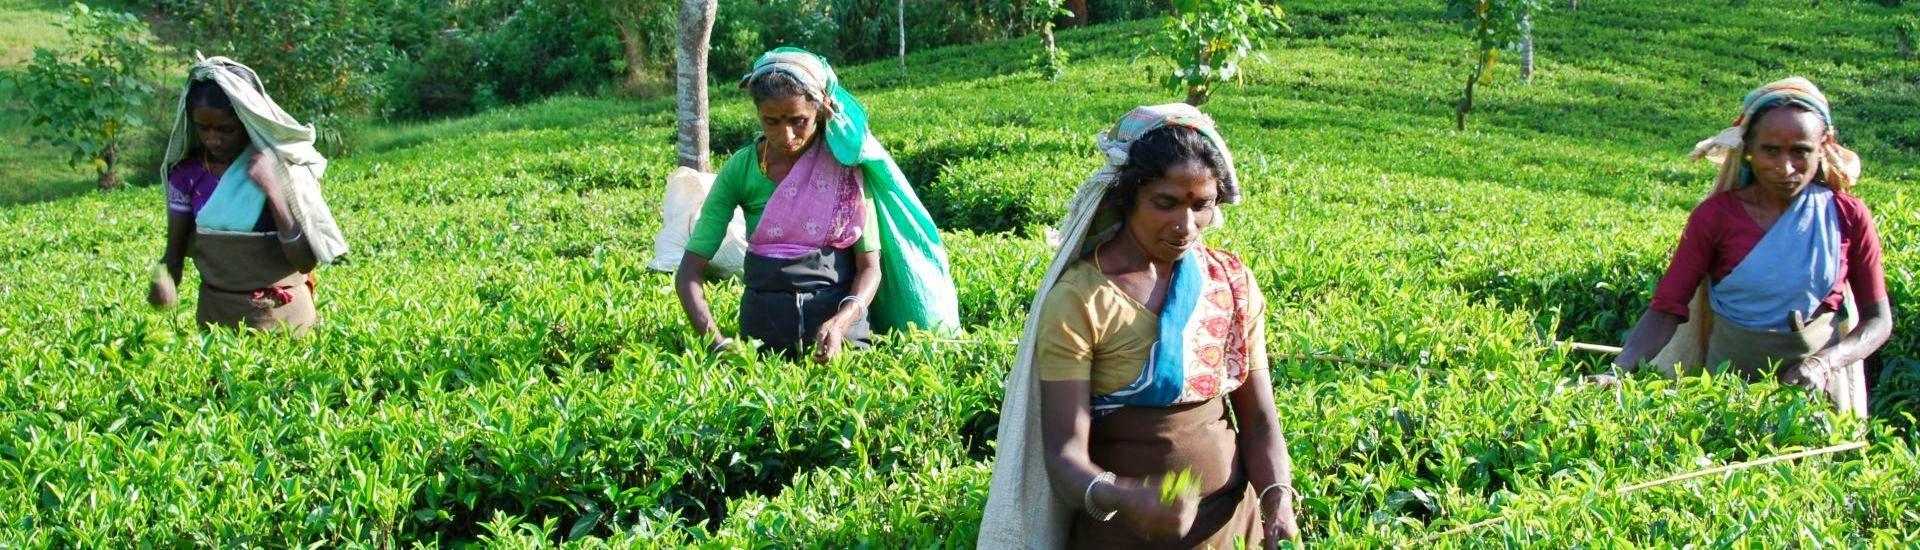 Herbaciane pola Cejlonu